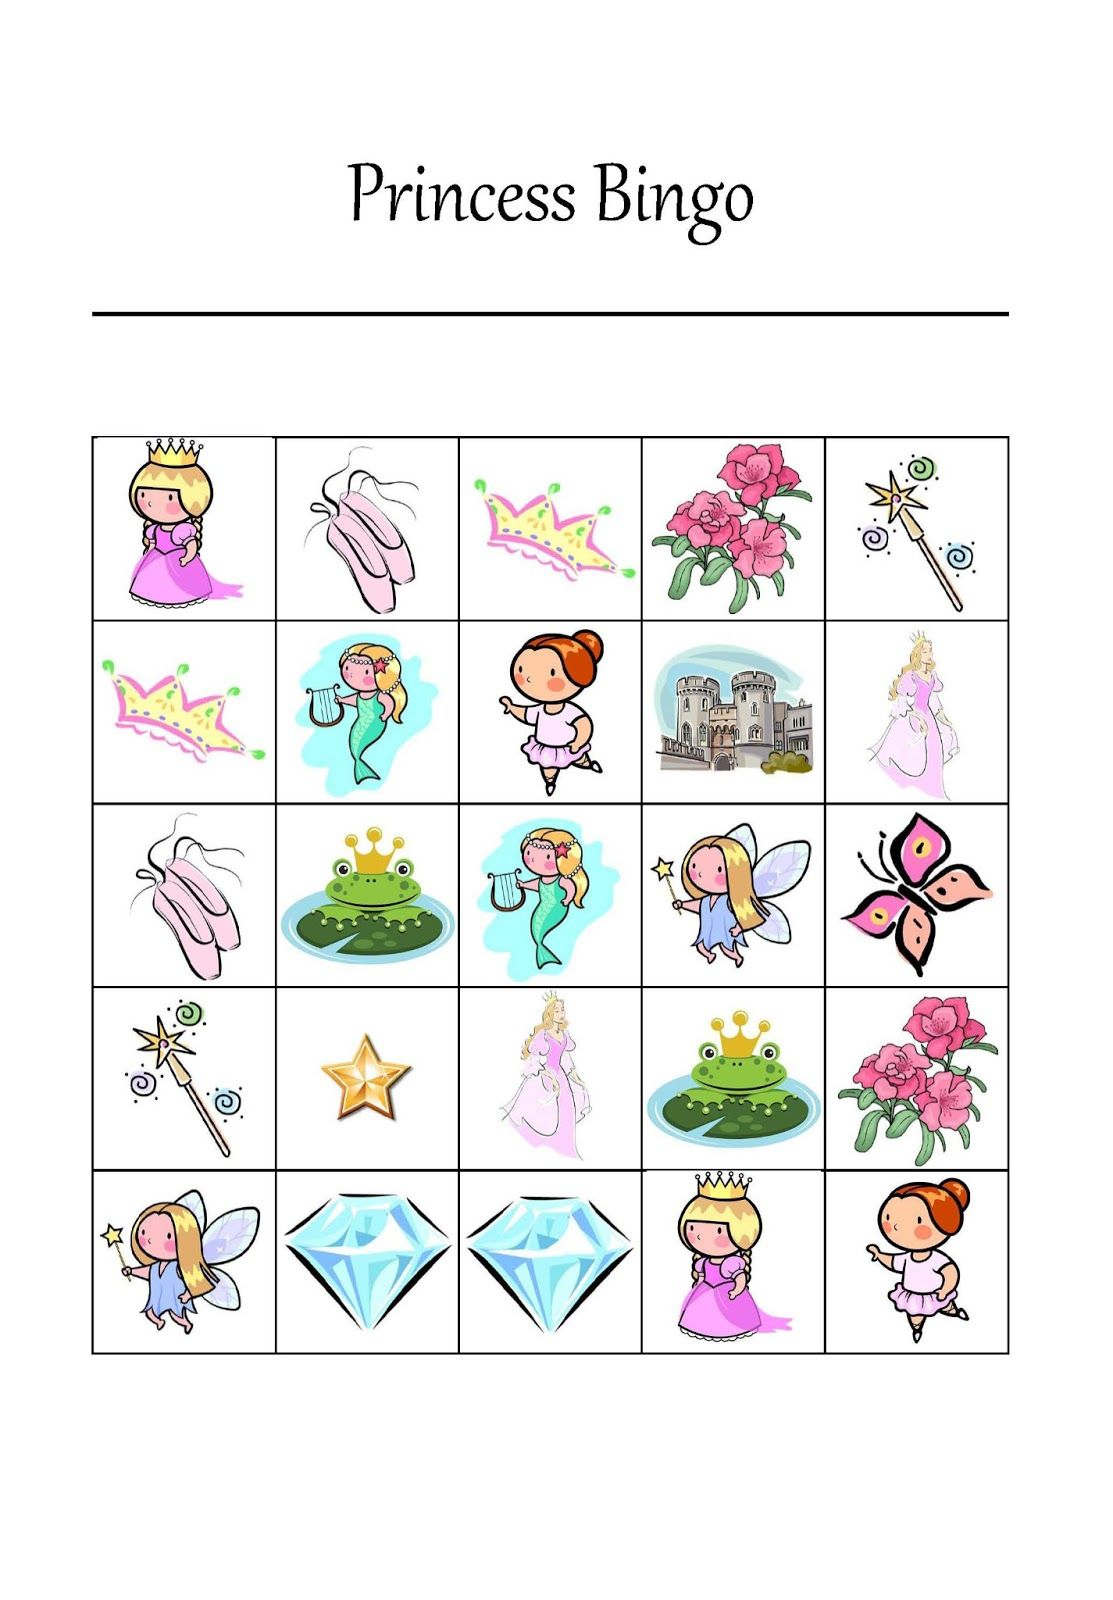 Free Printable Princess Bingo Game | Princess Bingo